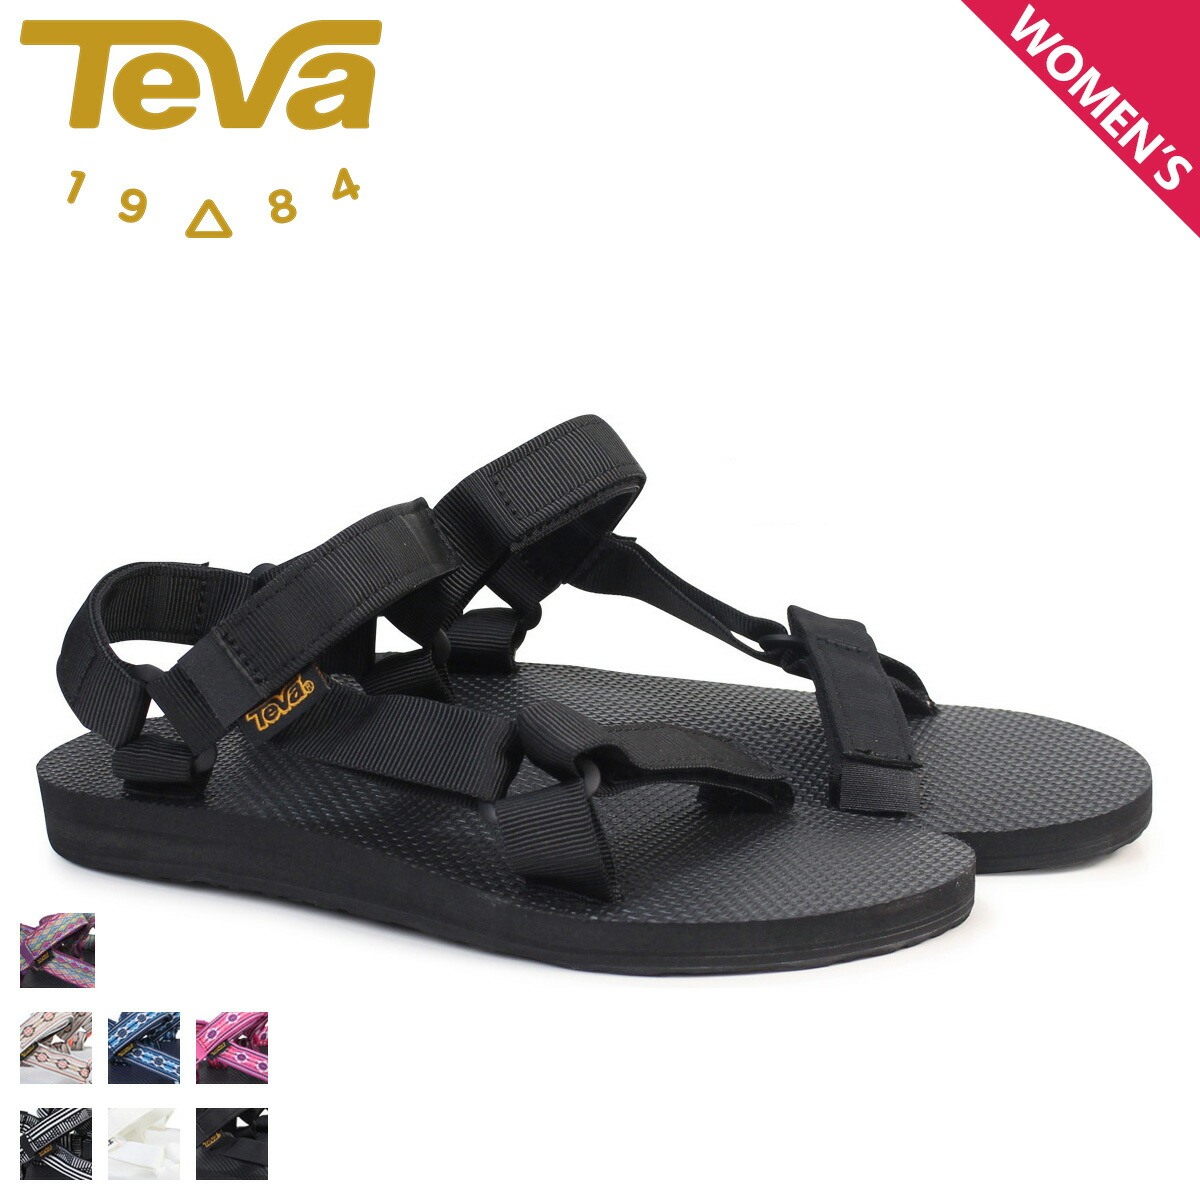 b187a7659 SneaK Online Shop  Teva Teva sandals Lady s original universal ... Teva